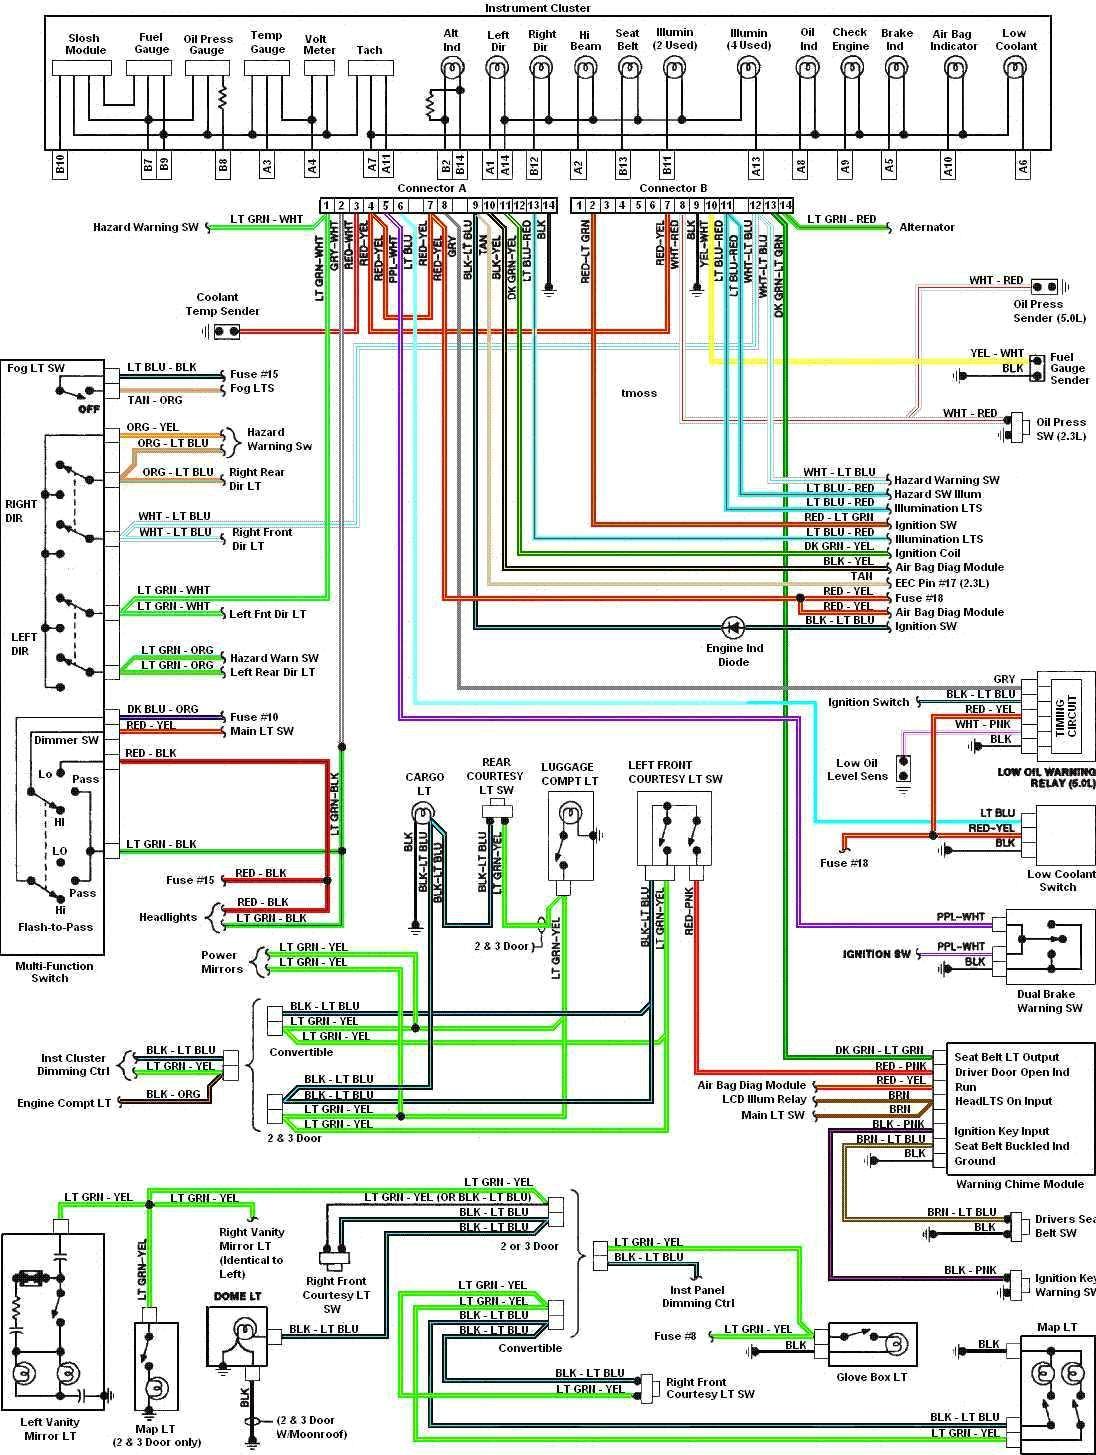 2004 ford f250 lariat radio wiring diagram 95 honda civic dx stereo 04 f550 fuse box library f450 super duty smart diagrams u2022 rh emgsolutions co 2008 f350